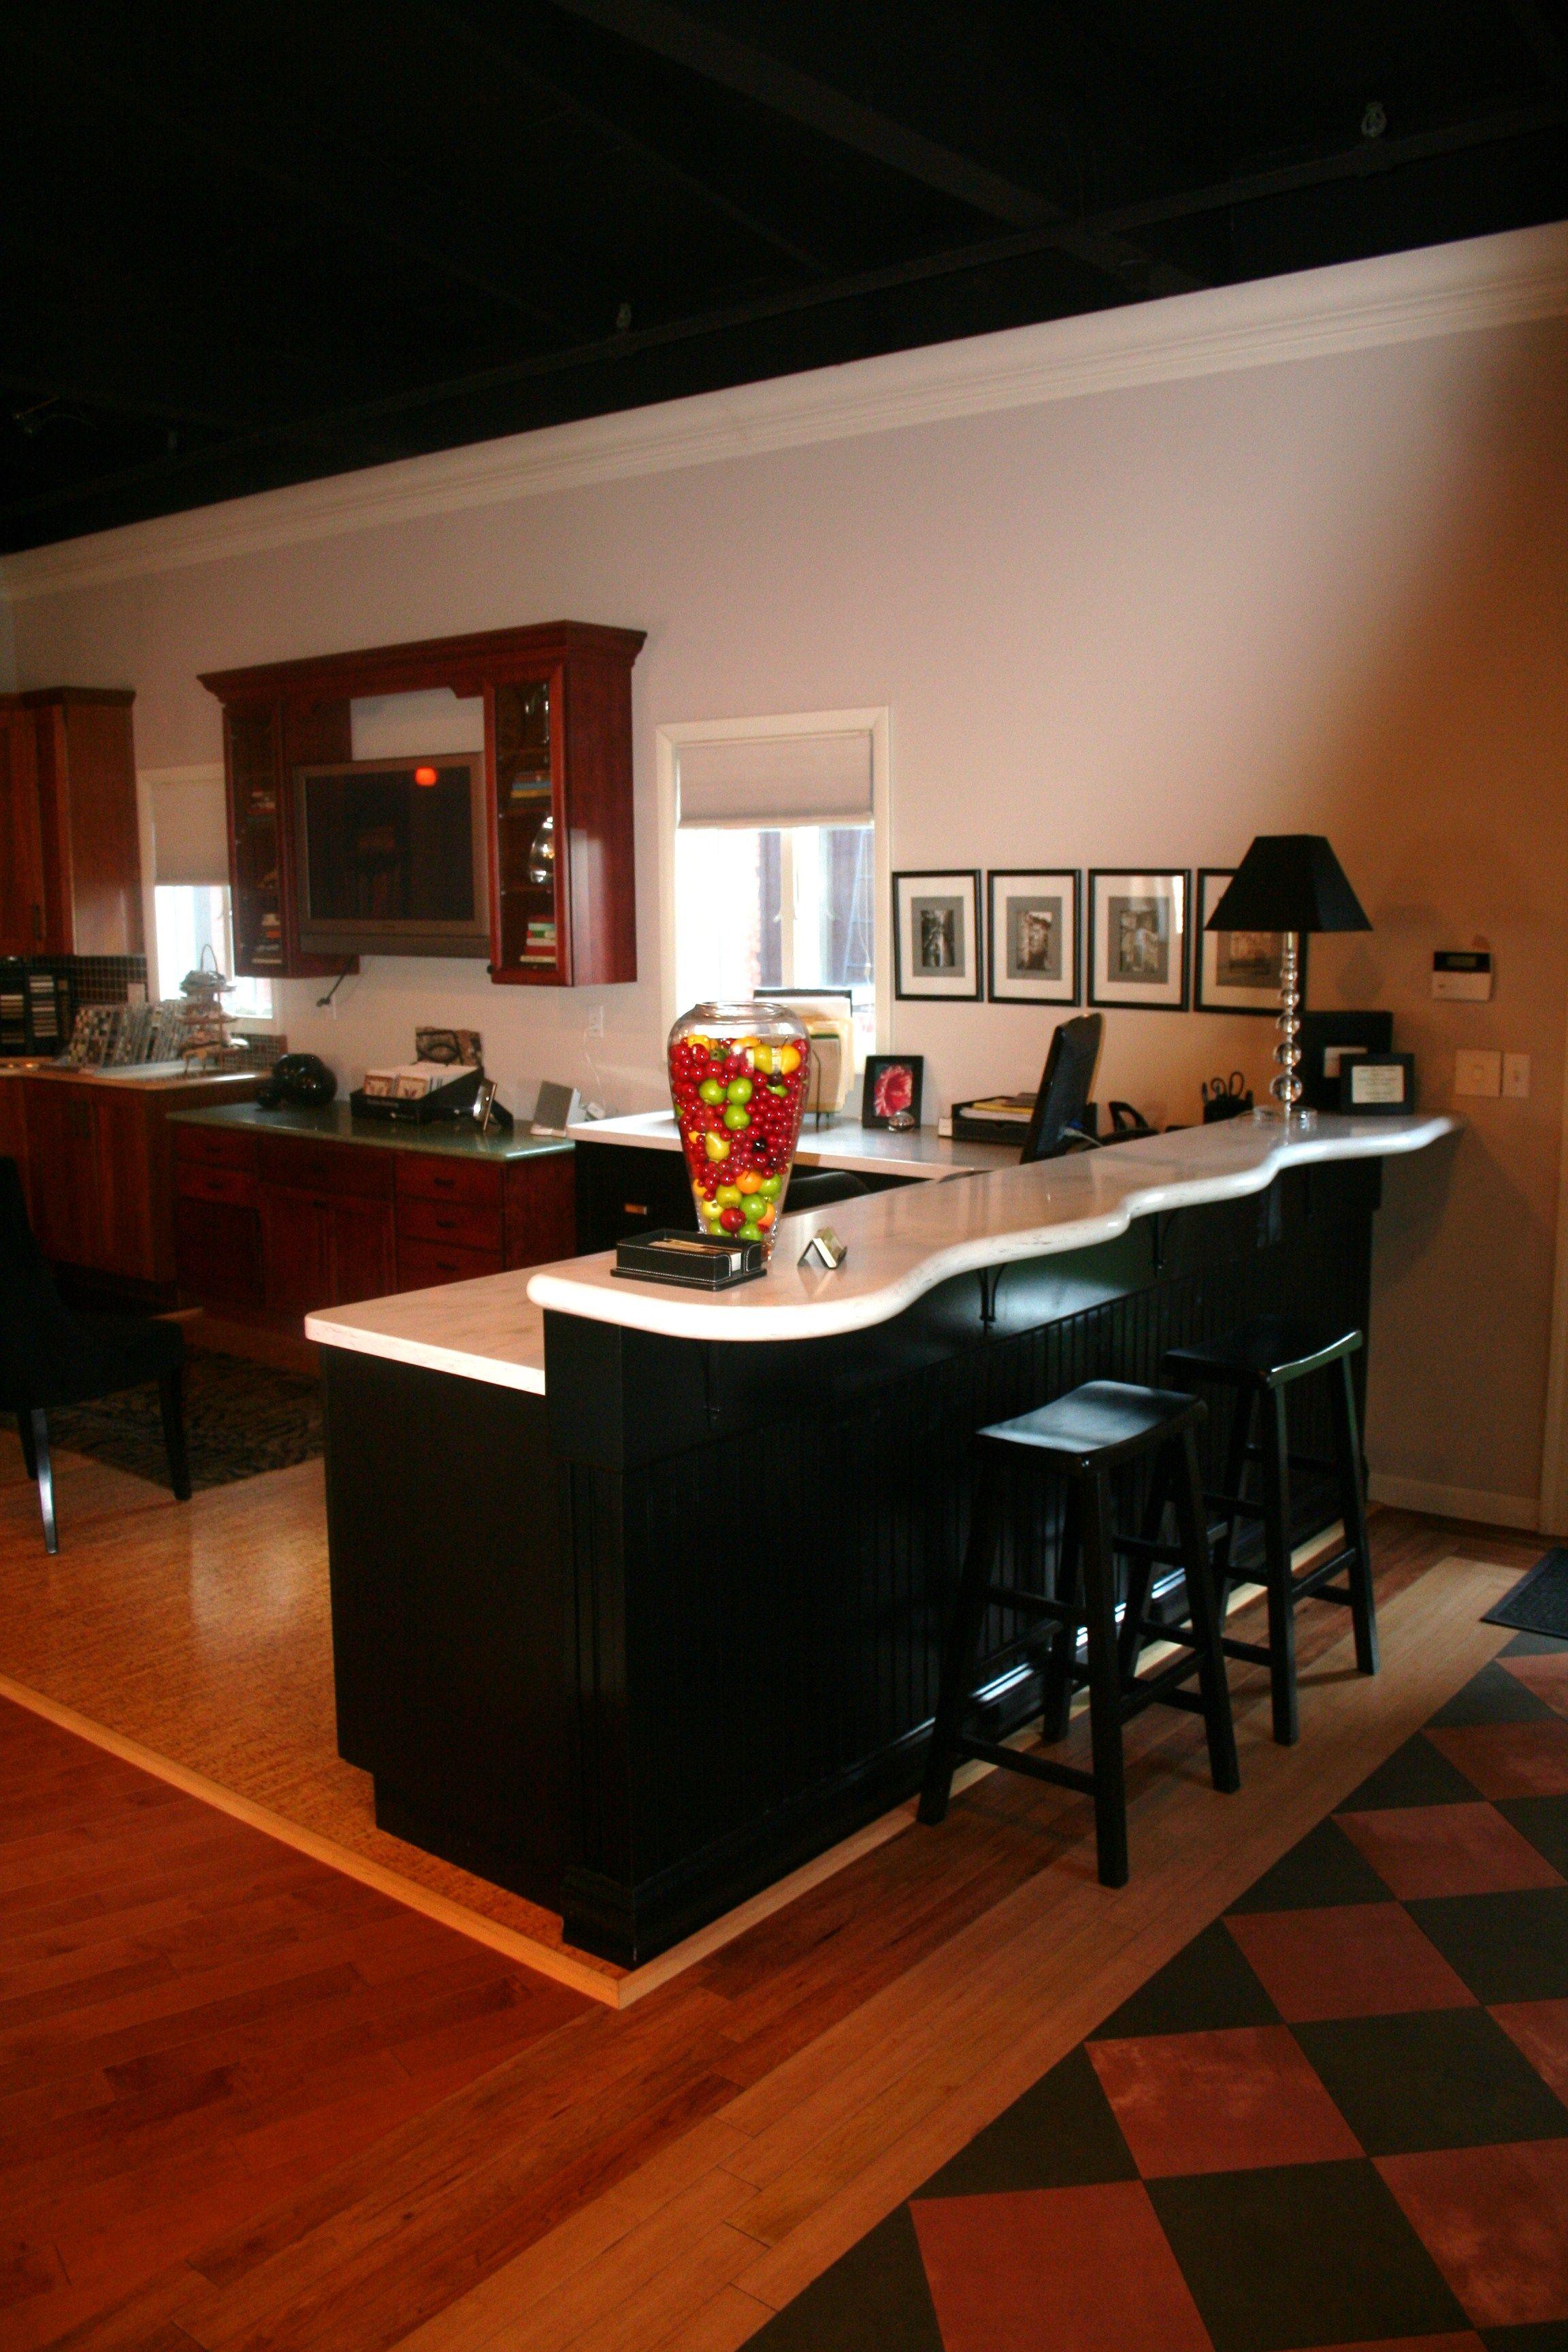 RI Kitchen U0026 Bath Design Showroom   East Providence, Rhode